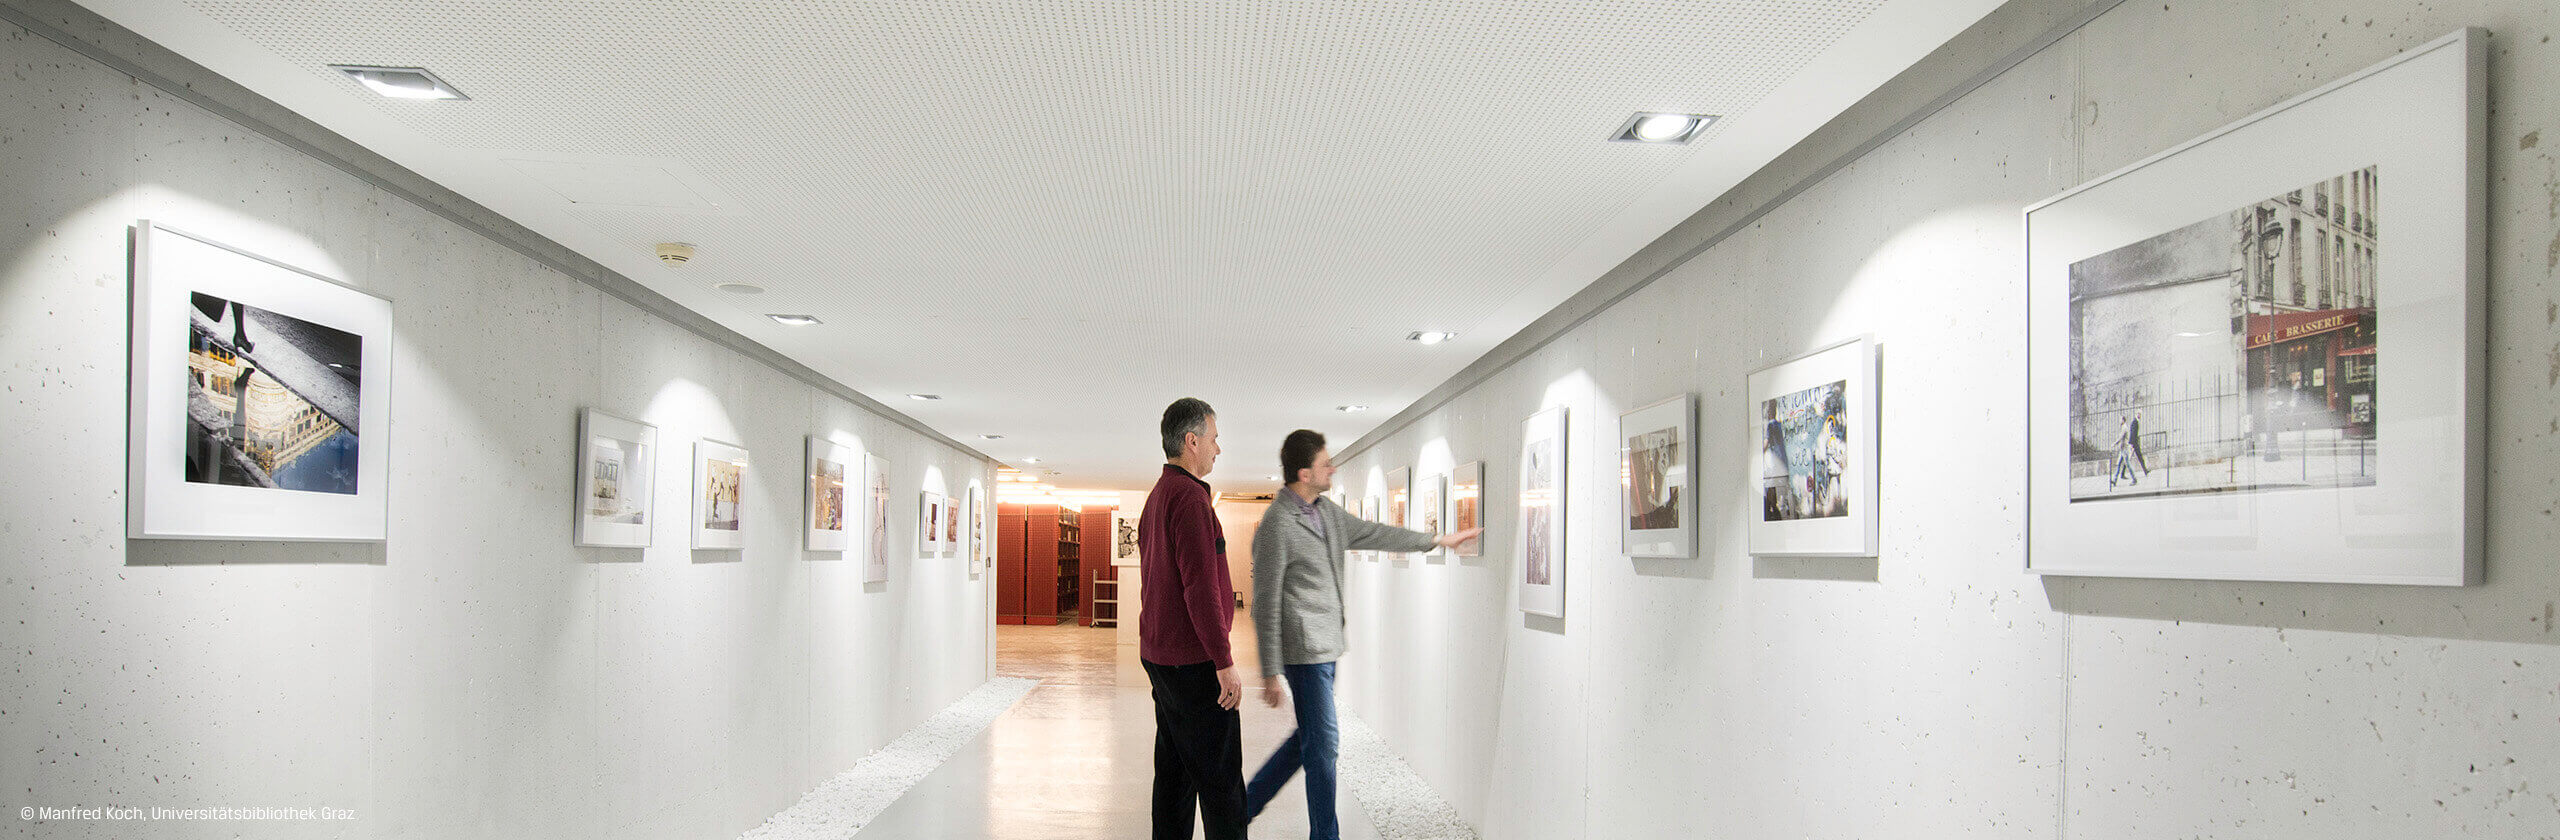 Großzügig K 12 Fotorahmen Zeitgenössisch - Familienfoto Kunst Ideen ...